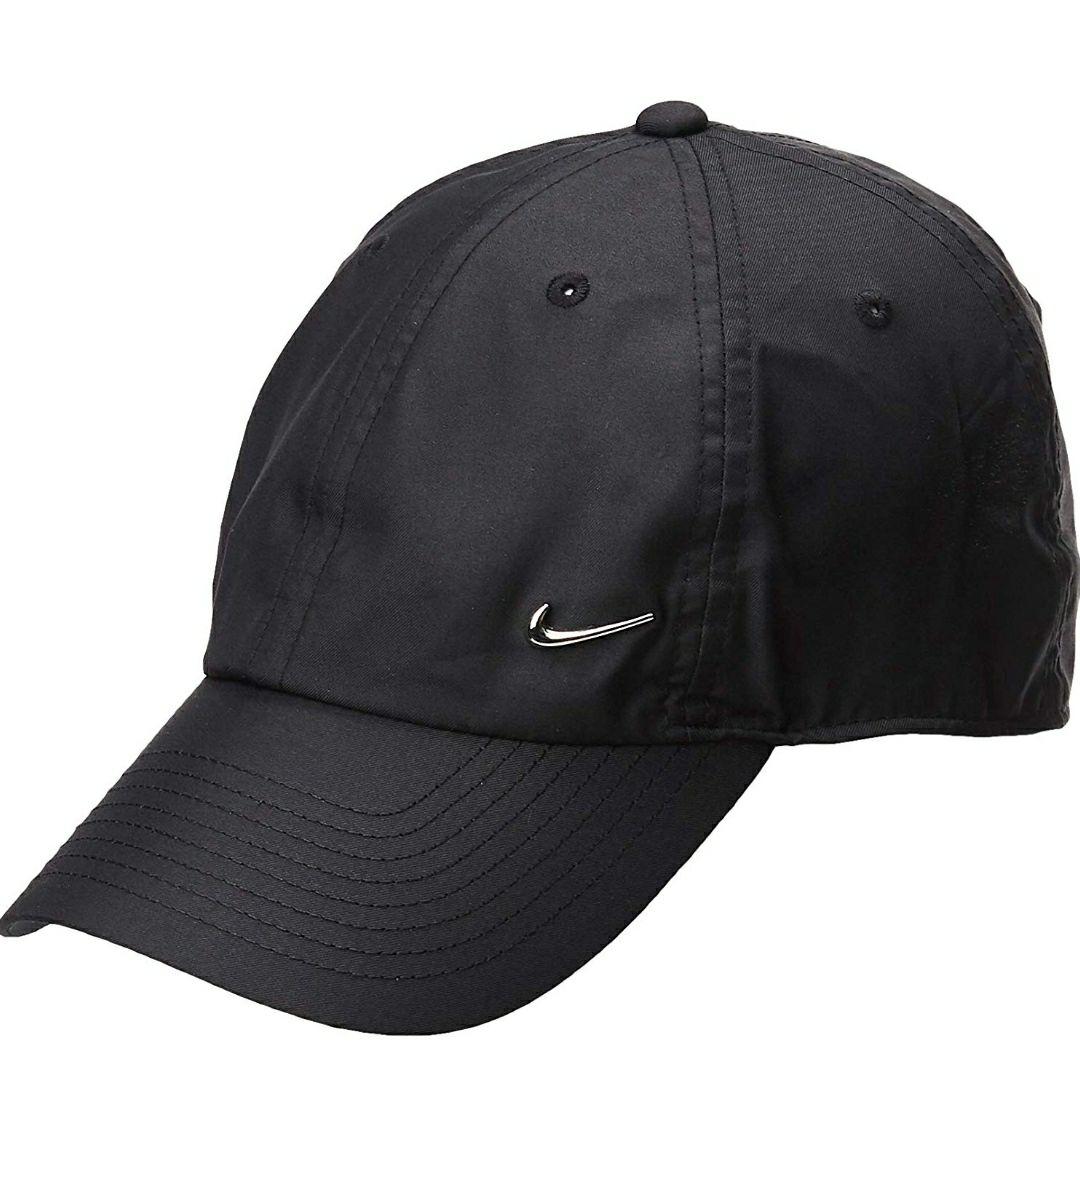 Gorra ajustable Nike Swoosh H86 negra y metal